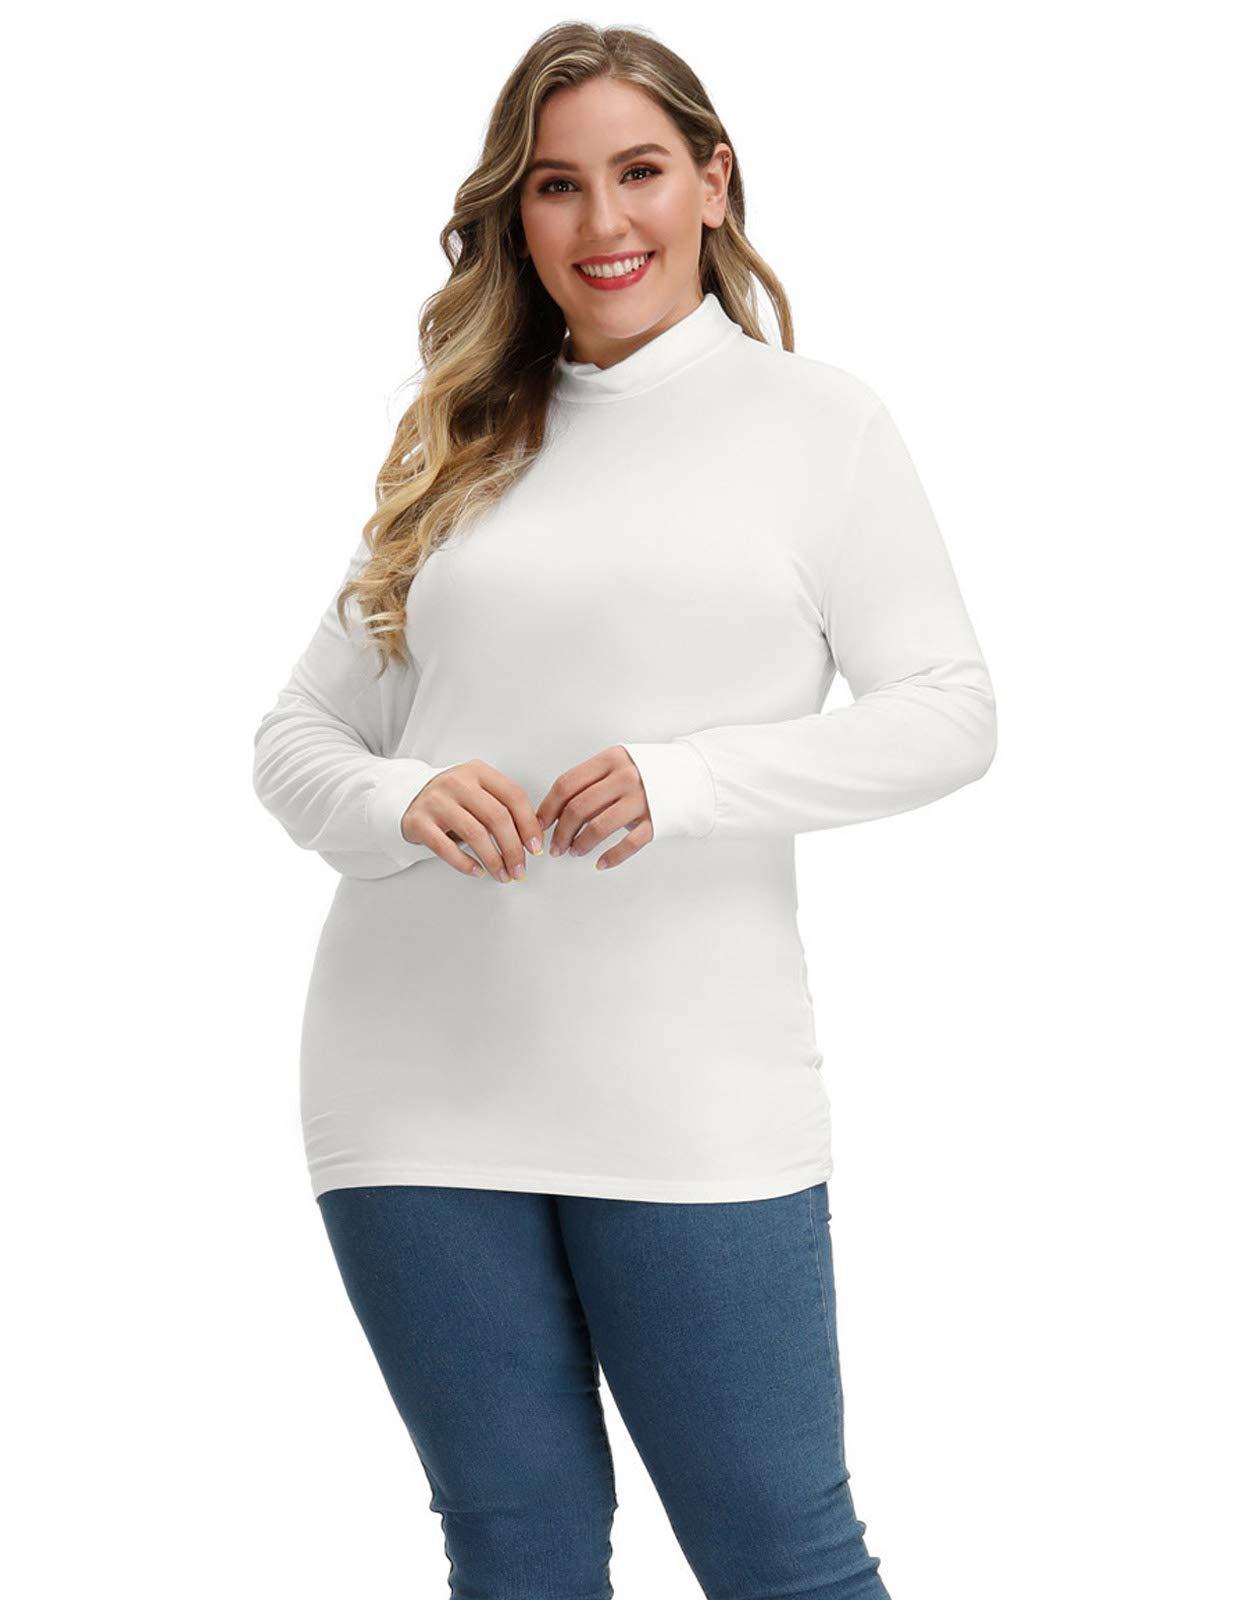 Hanna Nikole Plus Size Women Basic Soft Long Sleeve Mock Pullover Turtleneck Tops